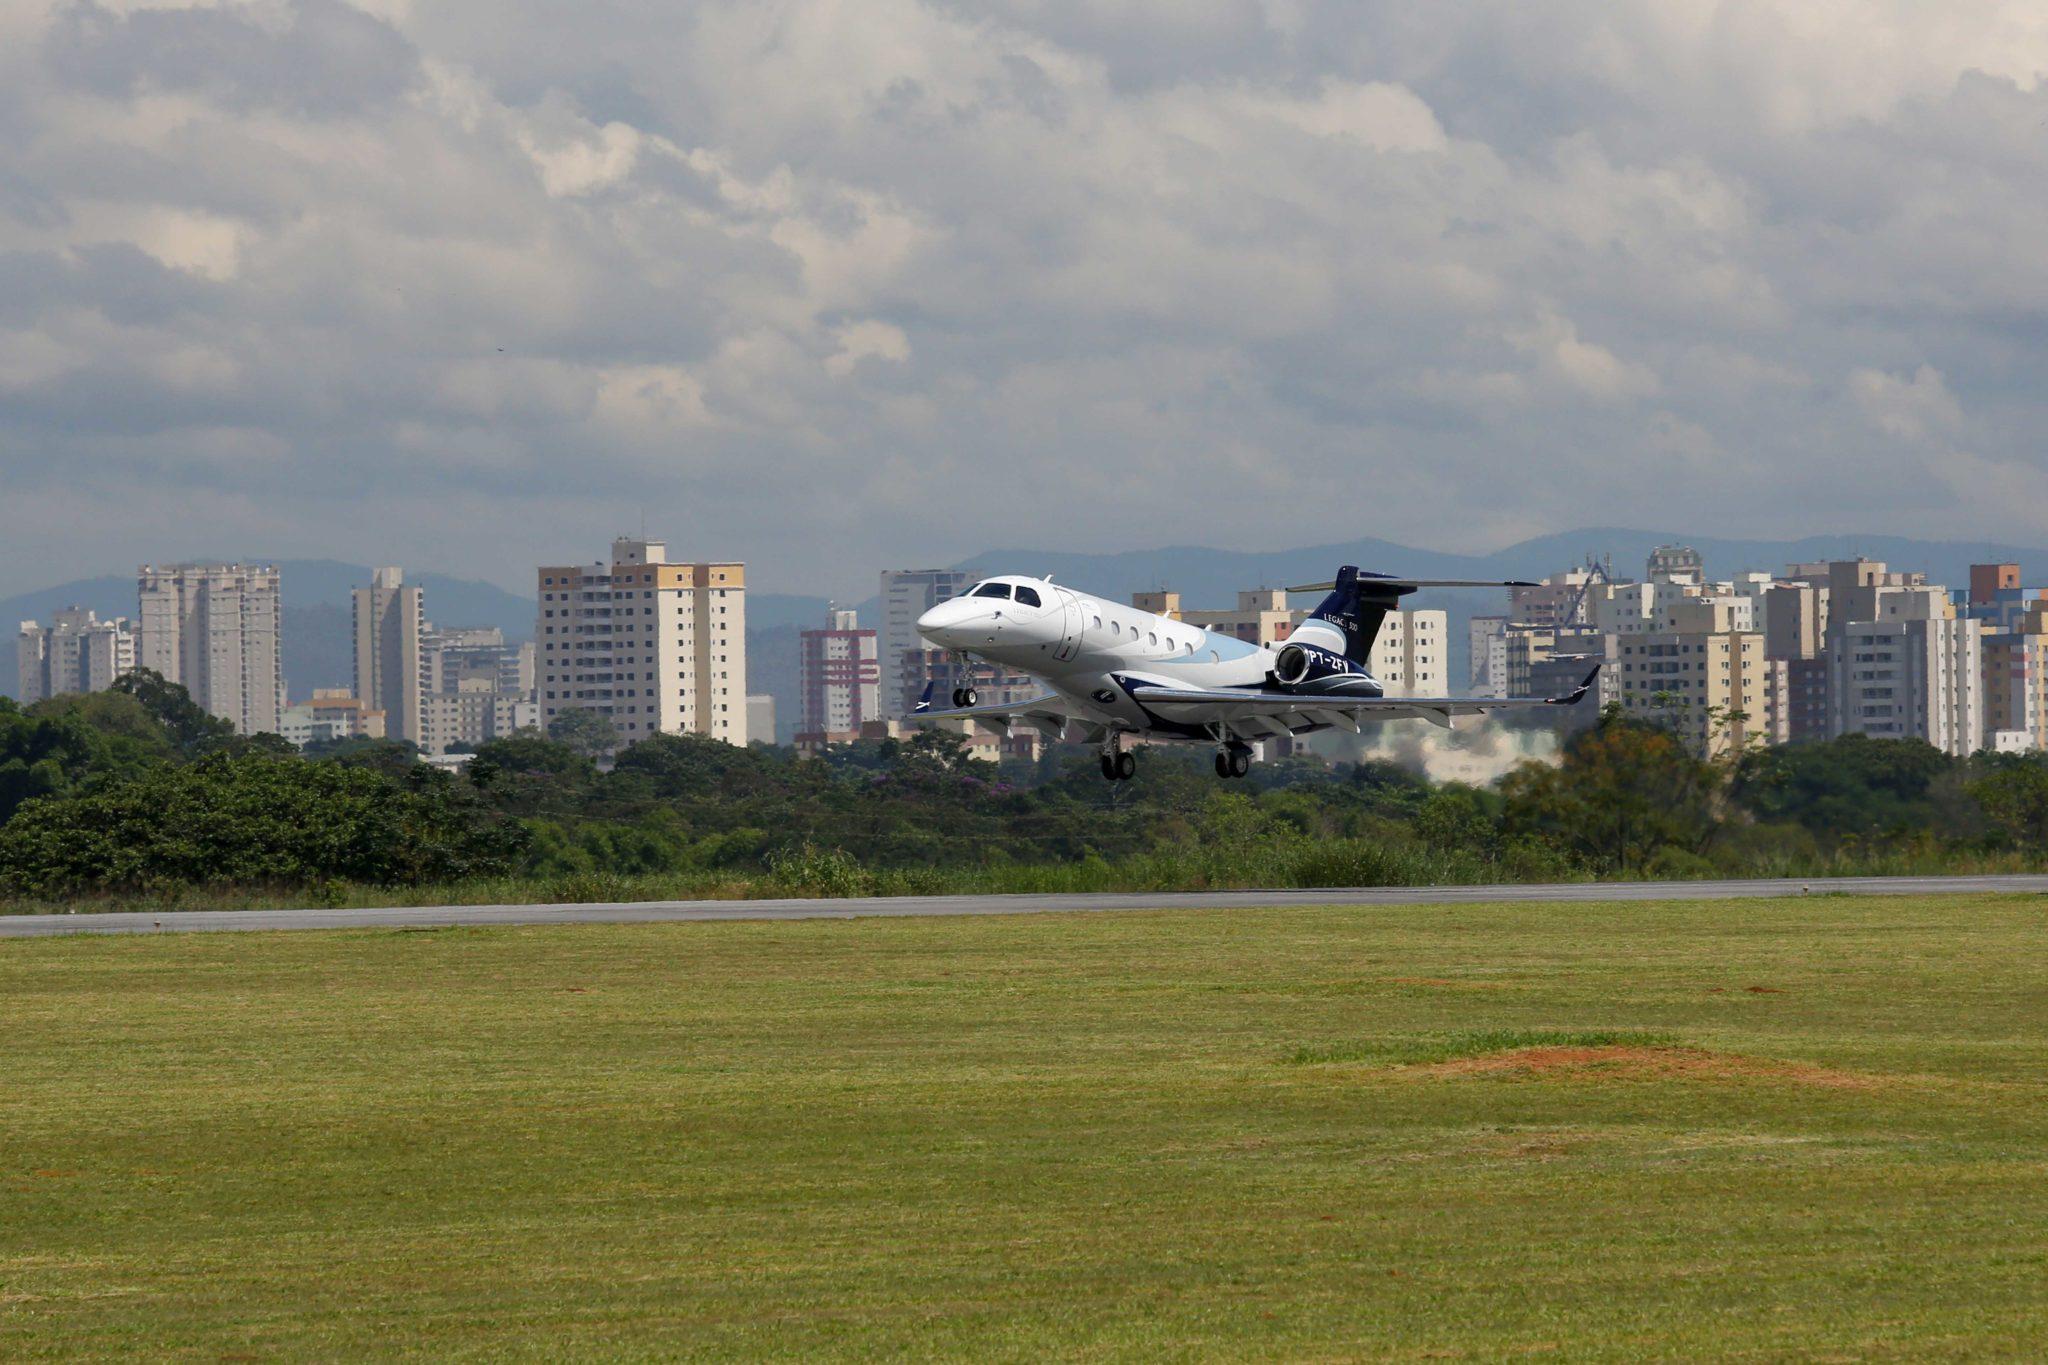 Third Embraer Legacy 500 Prototype Joins Flight-test Fleet